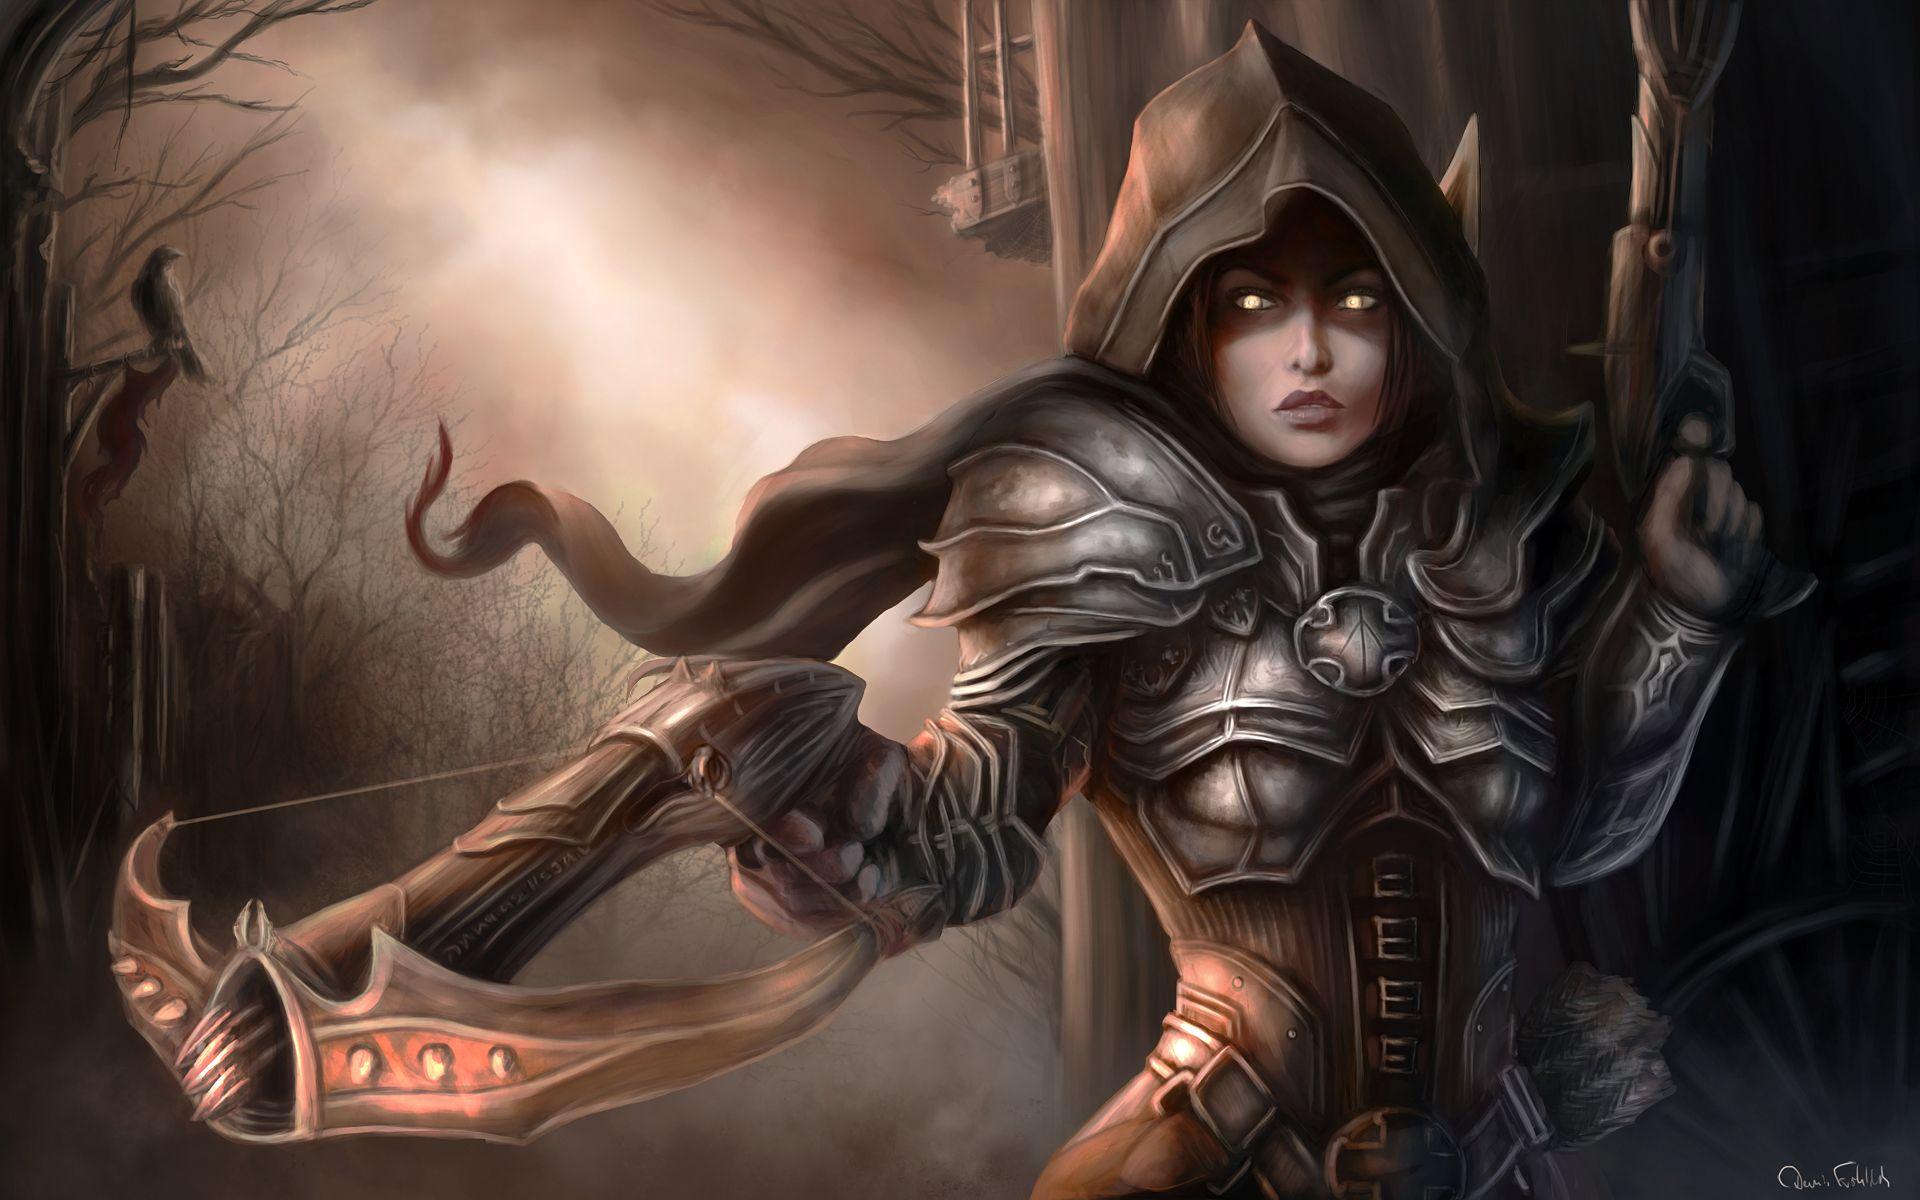 Demon Hunter Character Diablo Reaper Of Souls Wallpaper Demon